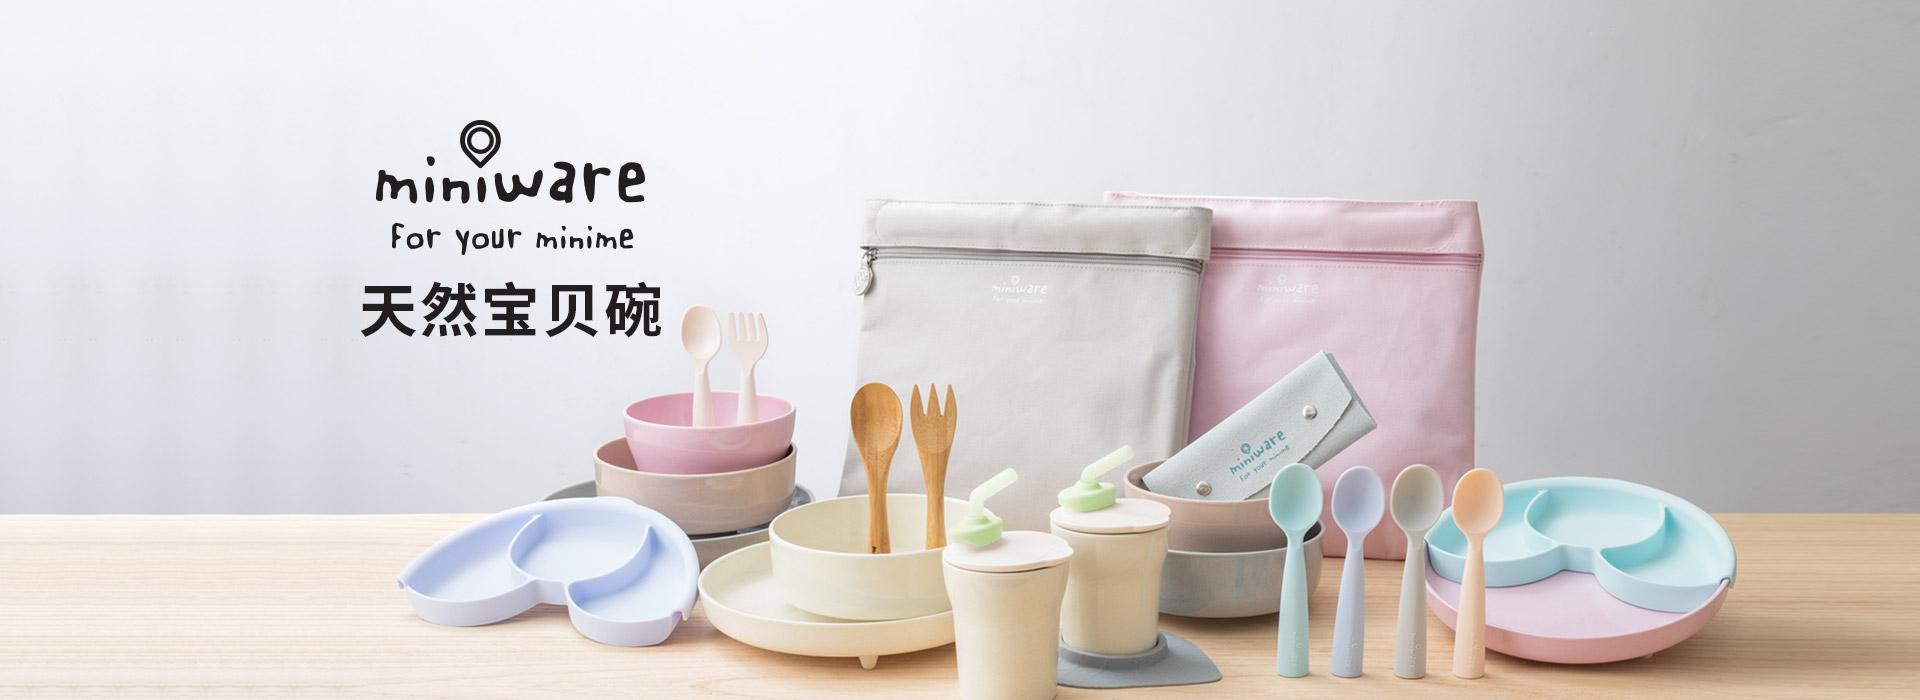 miniware健康宝宝餐具